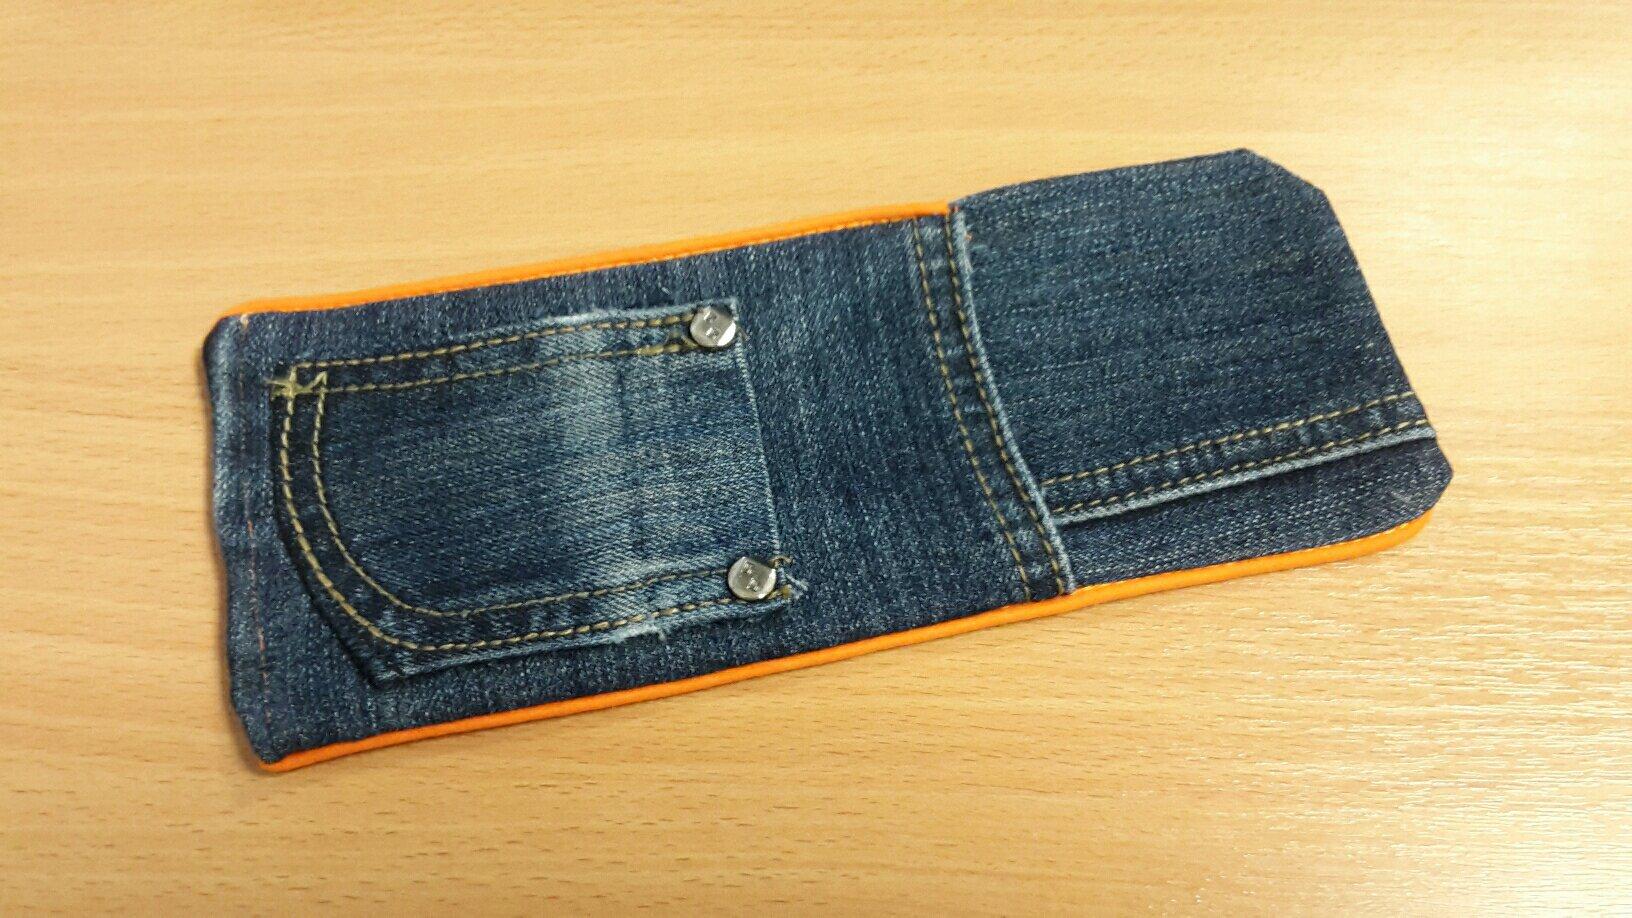 jeans cutlery bag ready